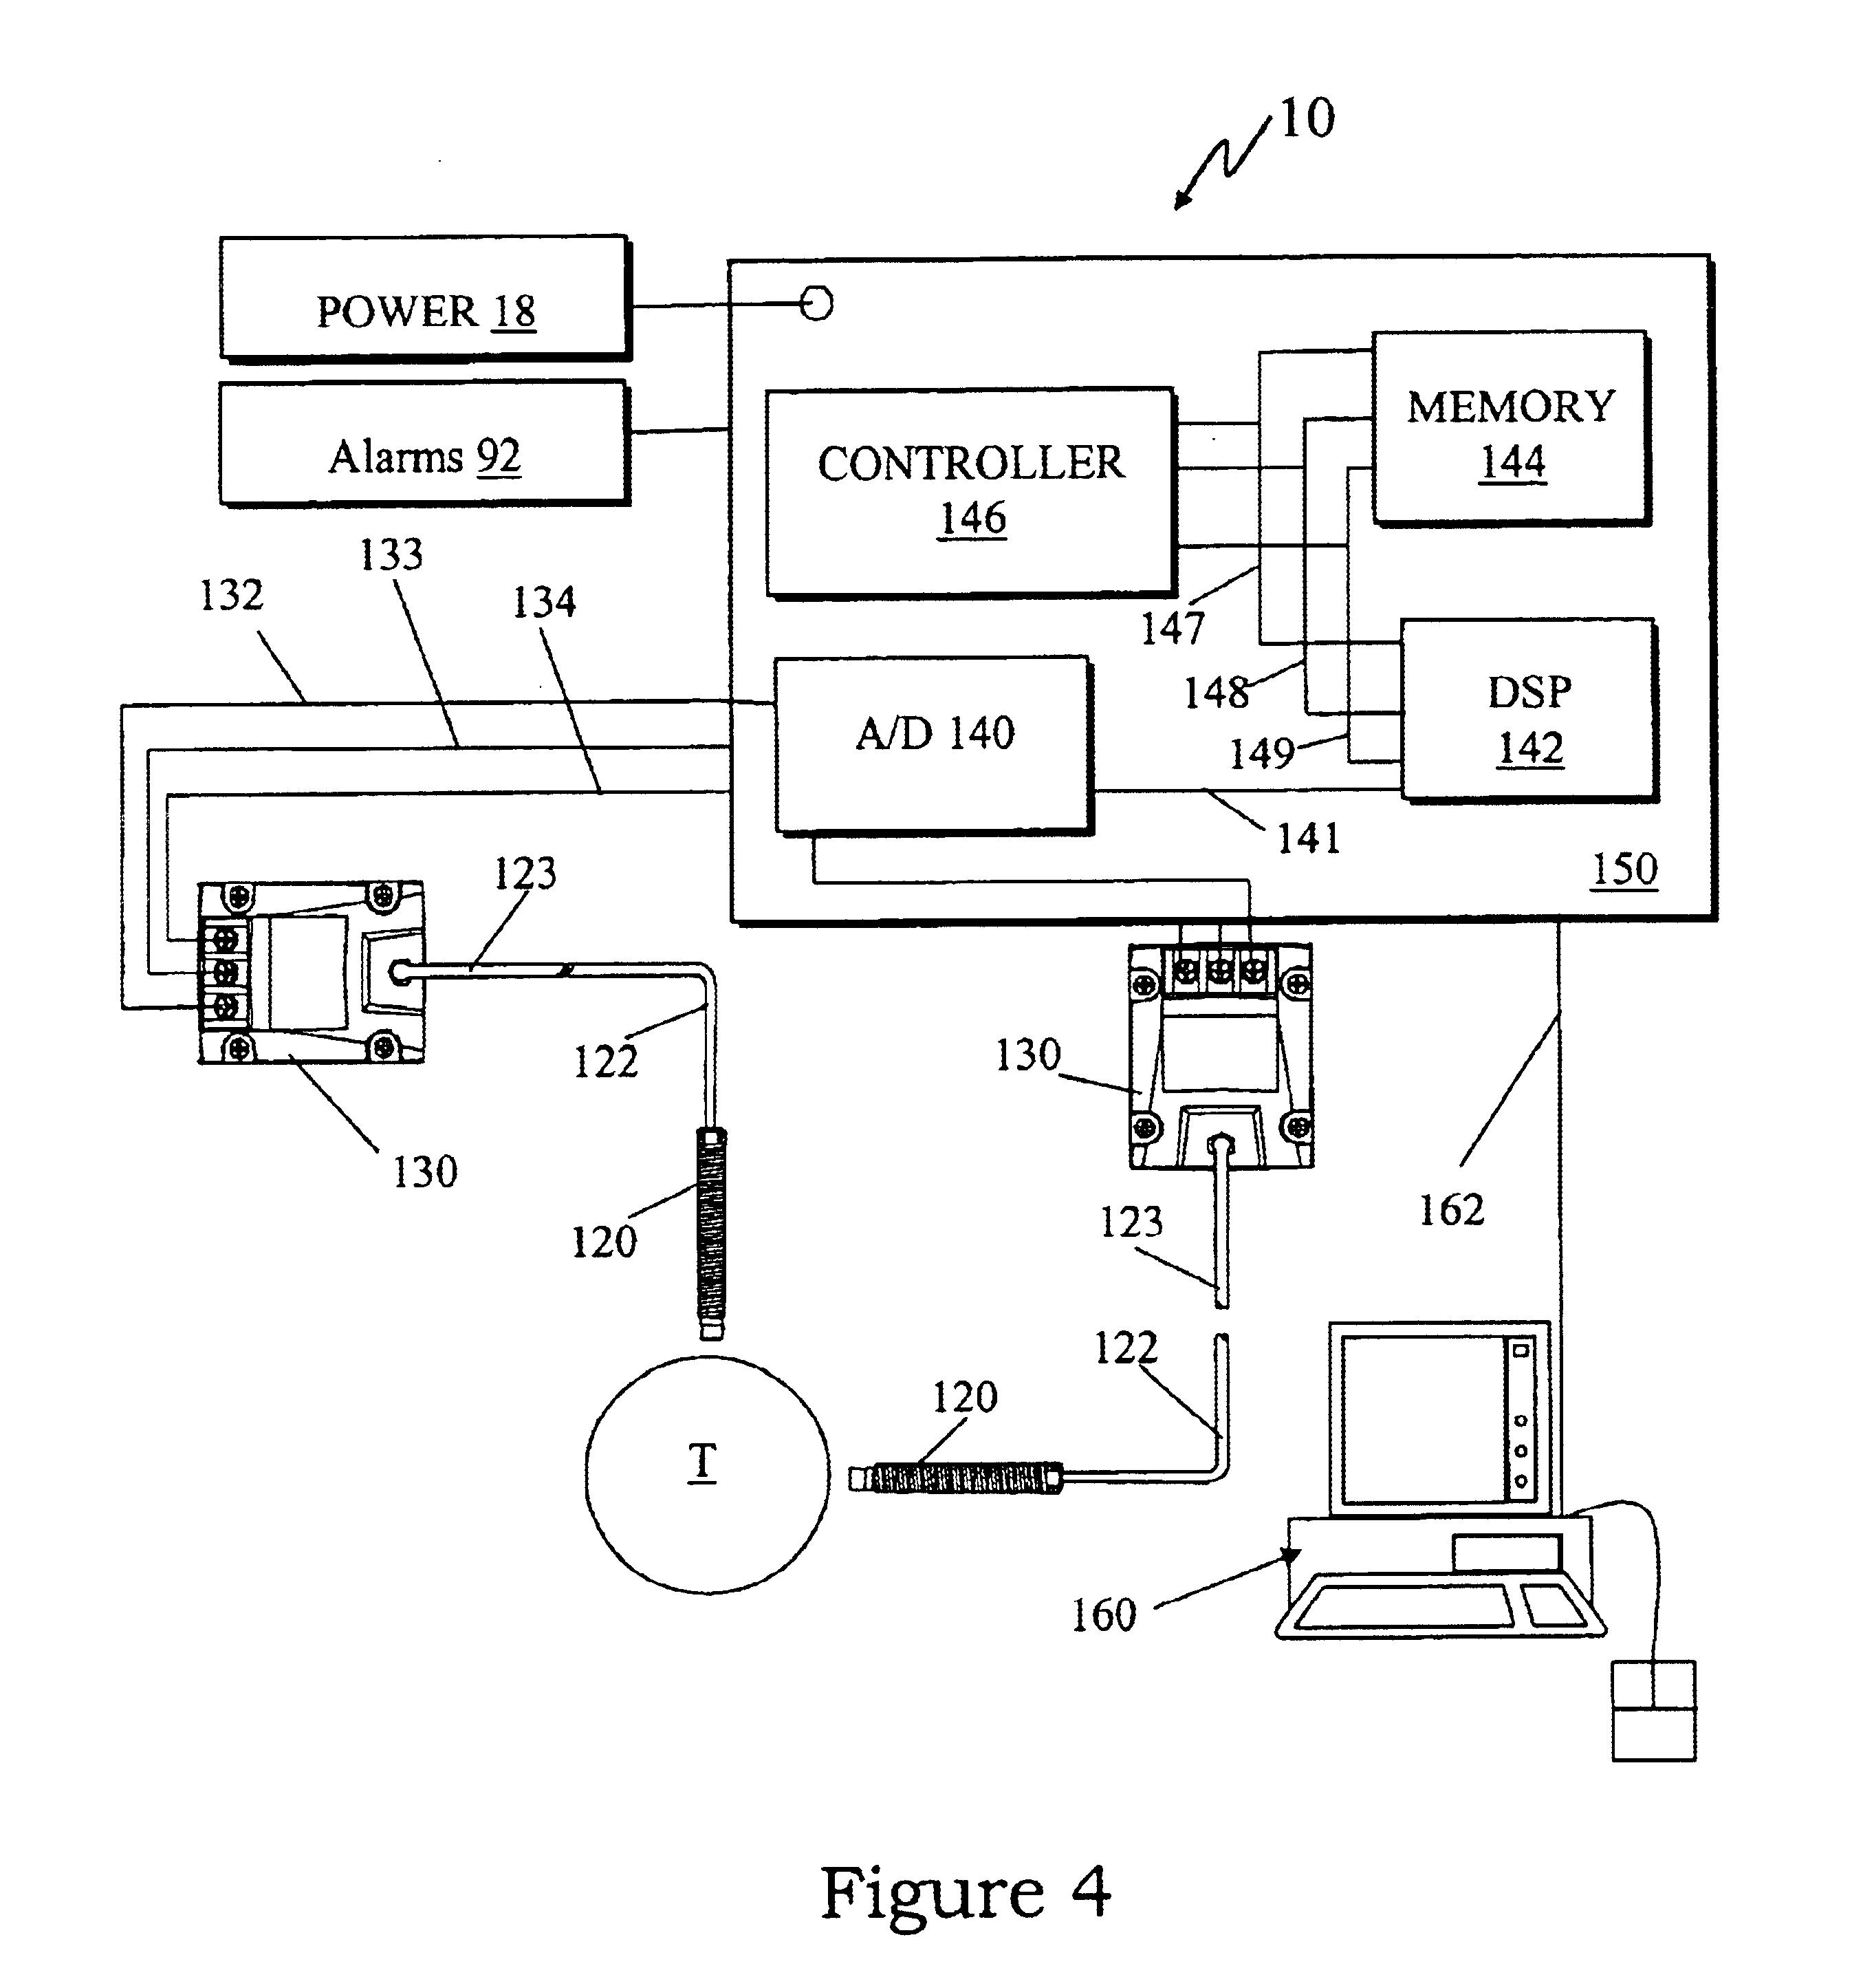 bently nevada 3500 wiring diagram data wiring diagrams \u2022